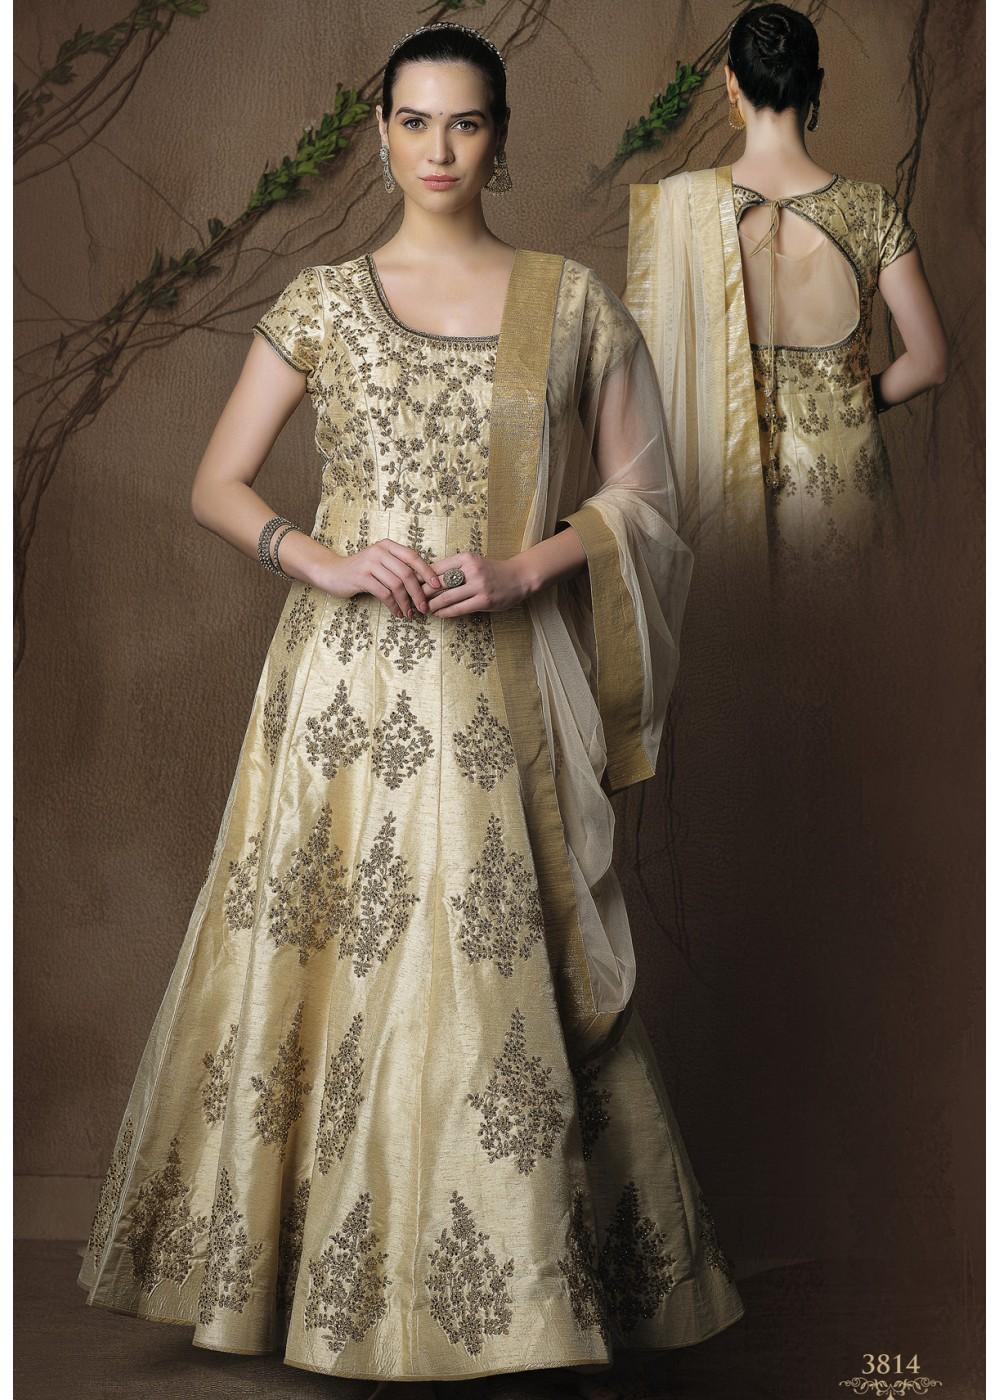 Silk Dress Designs : dress, designs, CREAM, COLOR, FABRIC, DESIGNER